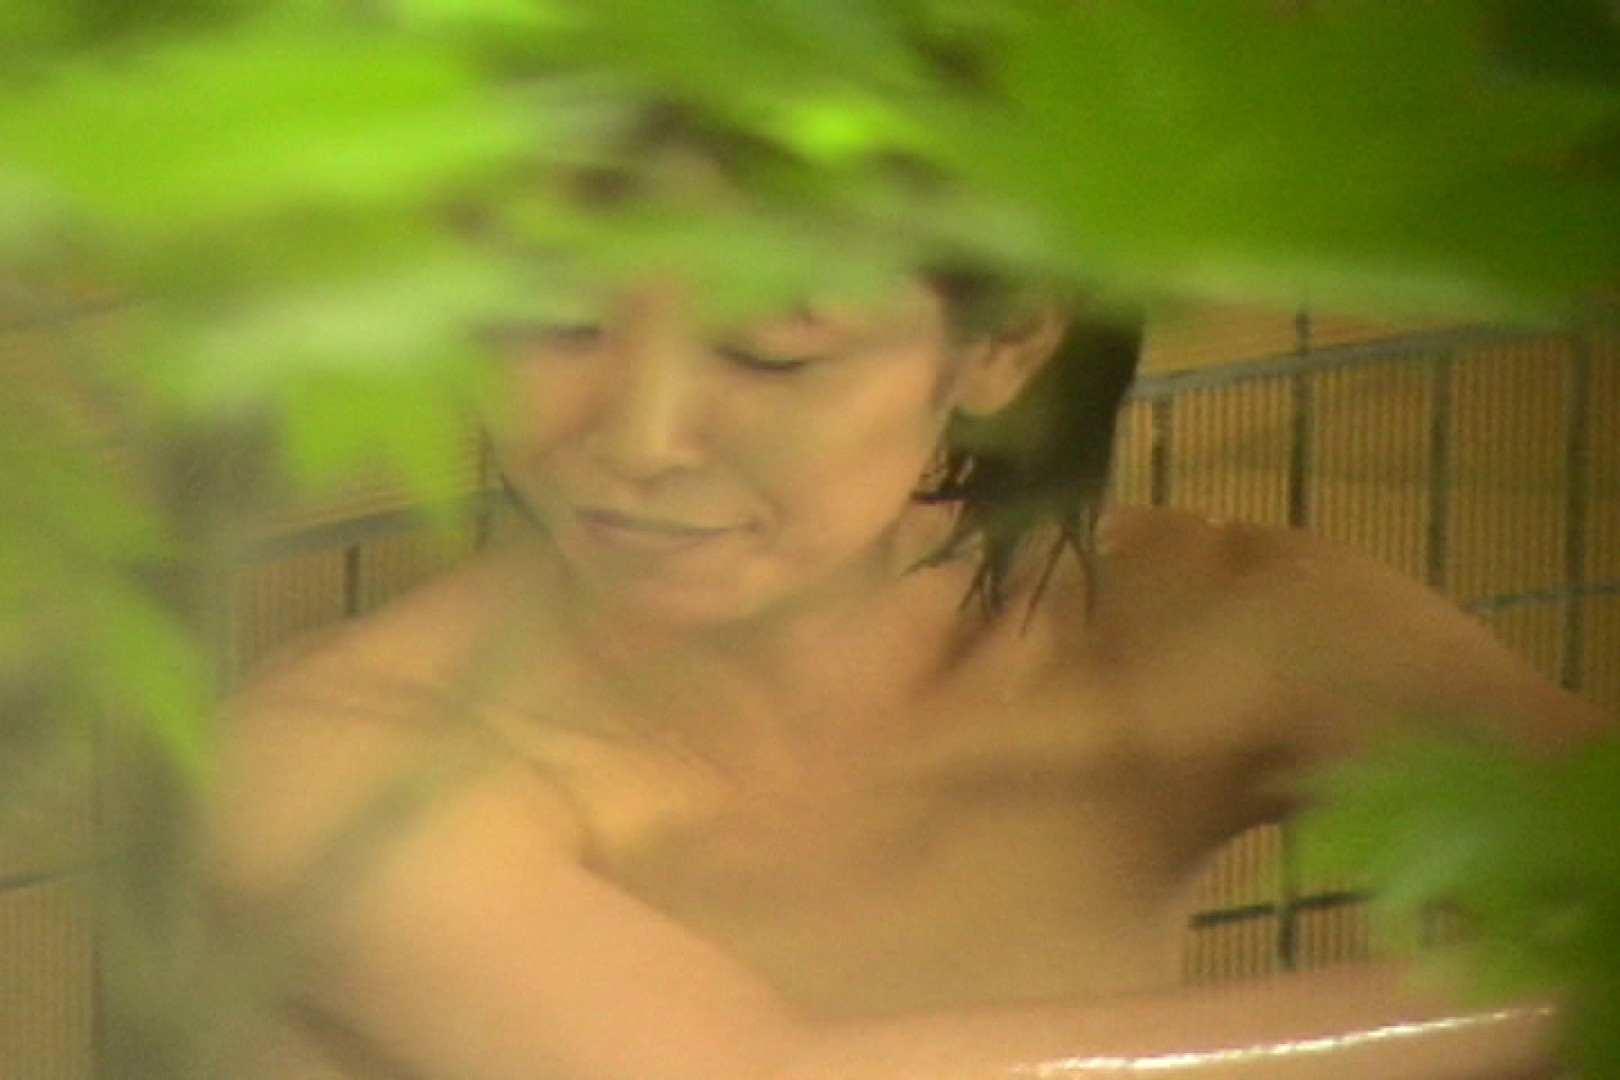 Aquaな露天風呂Vol.703 盗撮シリーズ   露天風呂編  95PIX 79